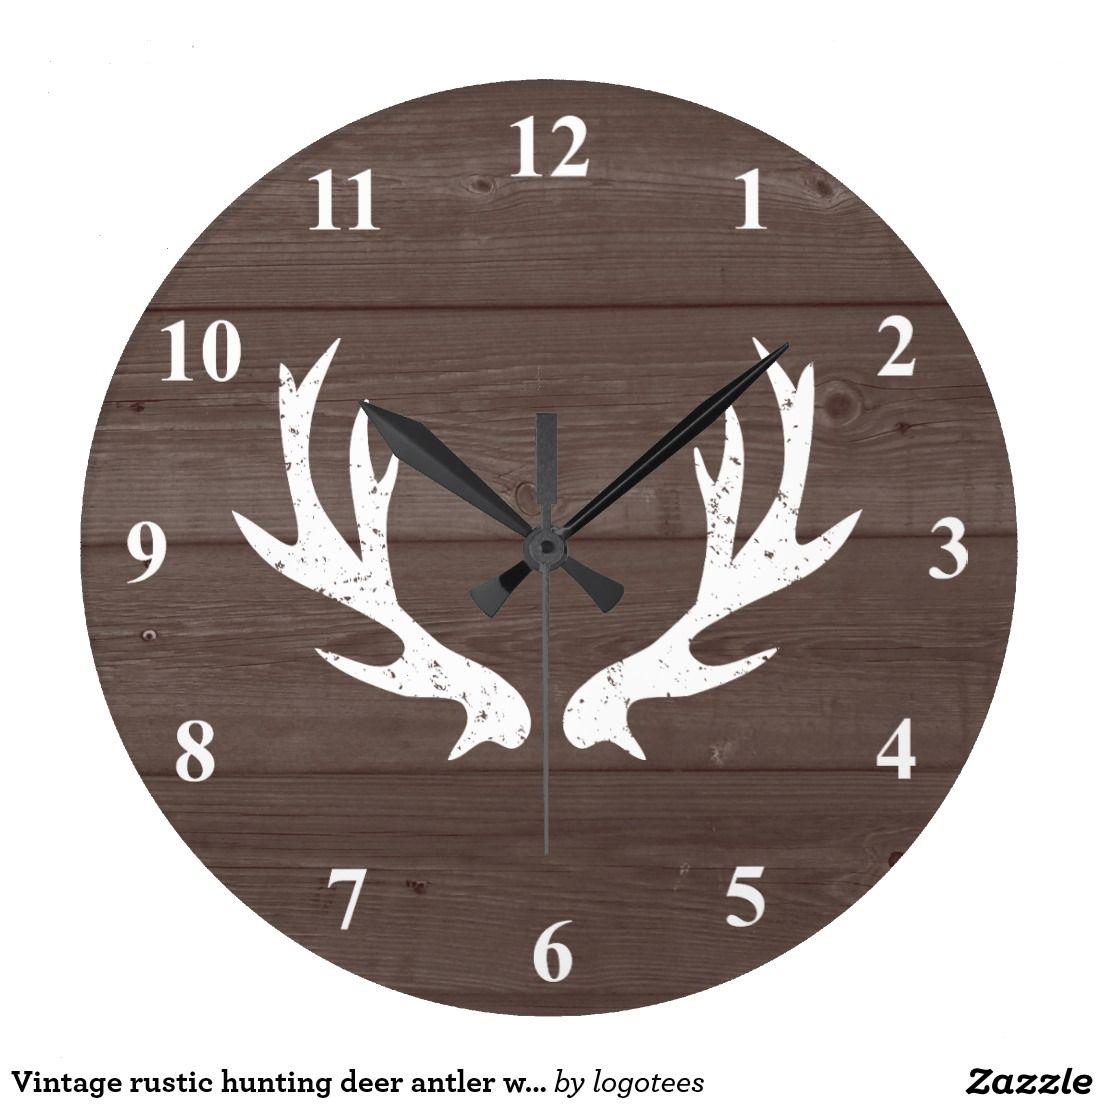 Vintage Rustic Hunting Deer Antler Wood Wall Clock Zazzle Com Wood Wall Clock Deer Bedroom Decor Wall Clock